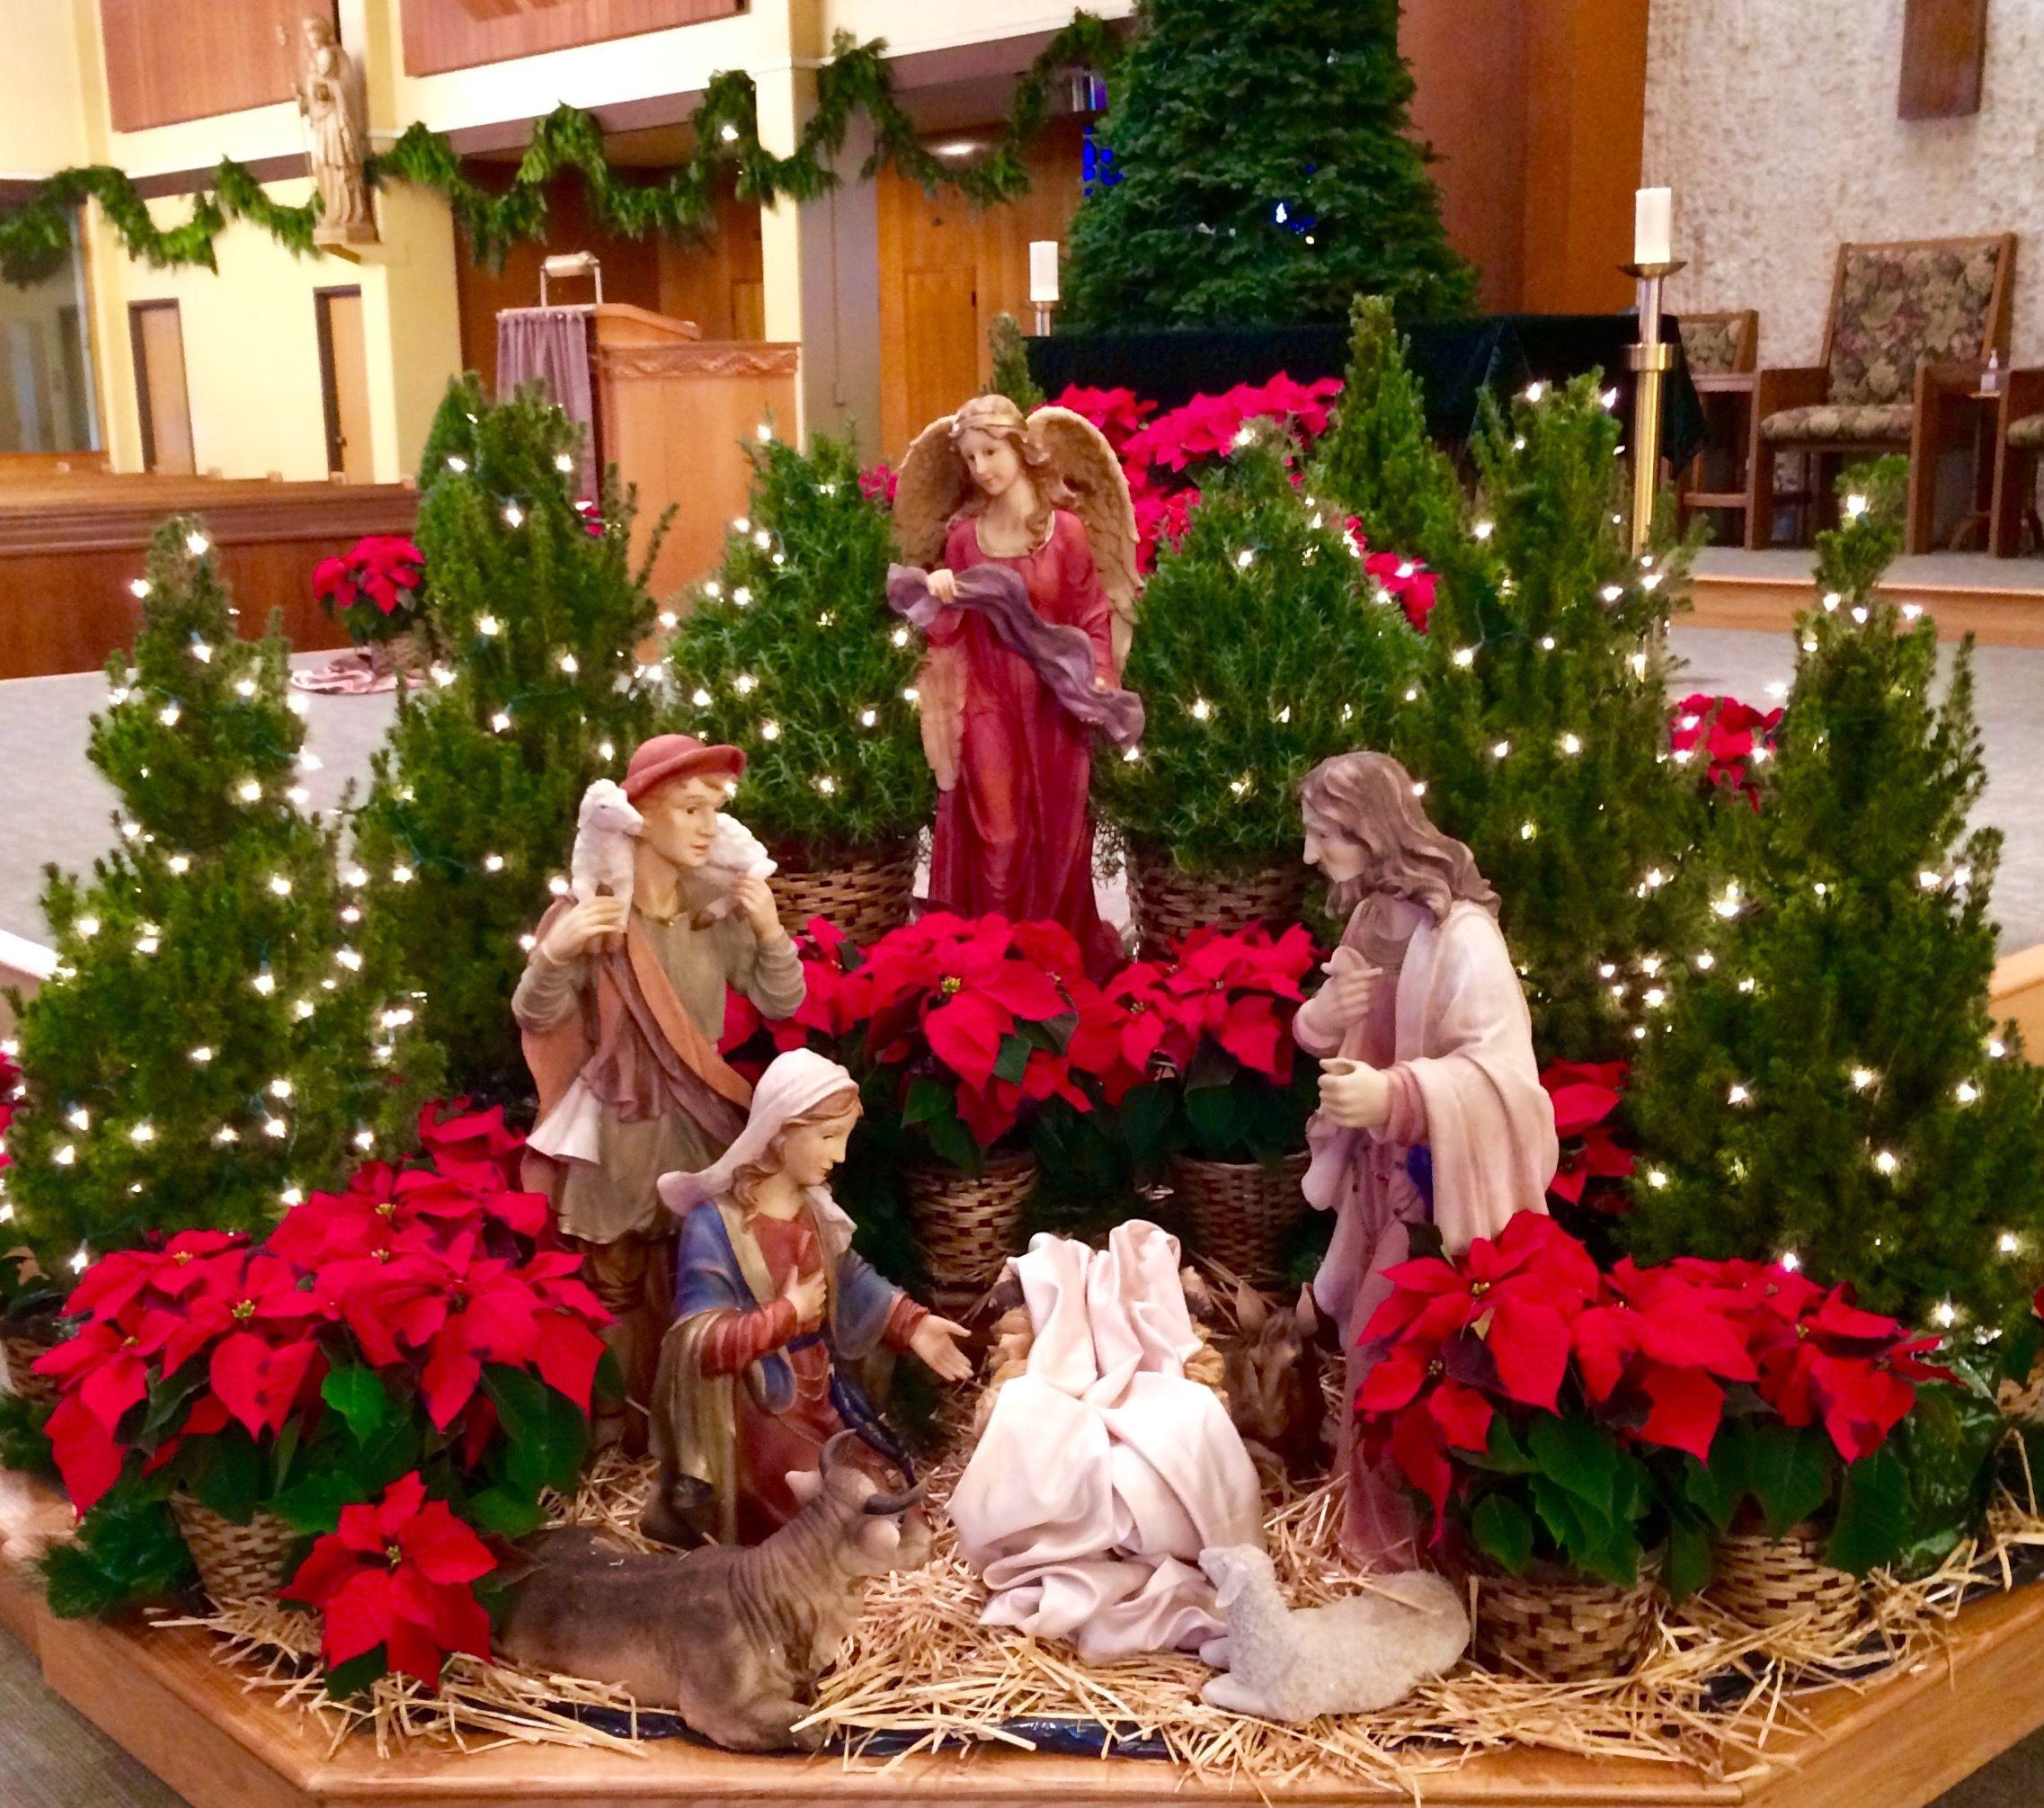 Waiting For Baby Jesus Holy Spirit Catholic Church Christmas 2015 Church Christmas Decorations Christmas Nativity Scene Christmas Church